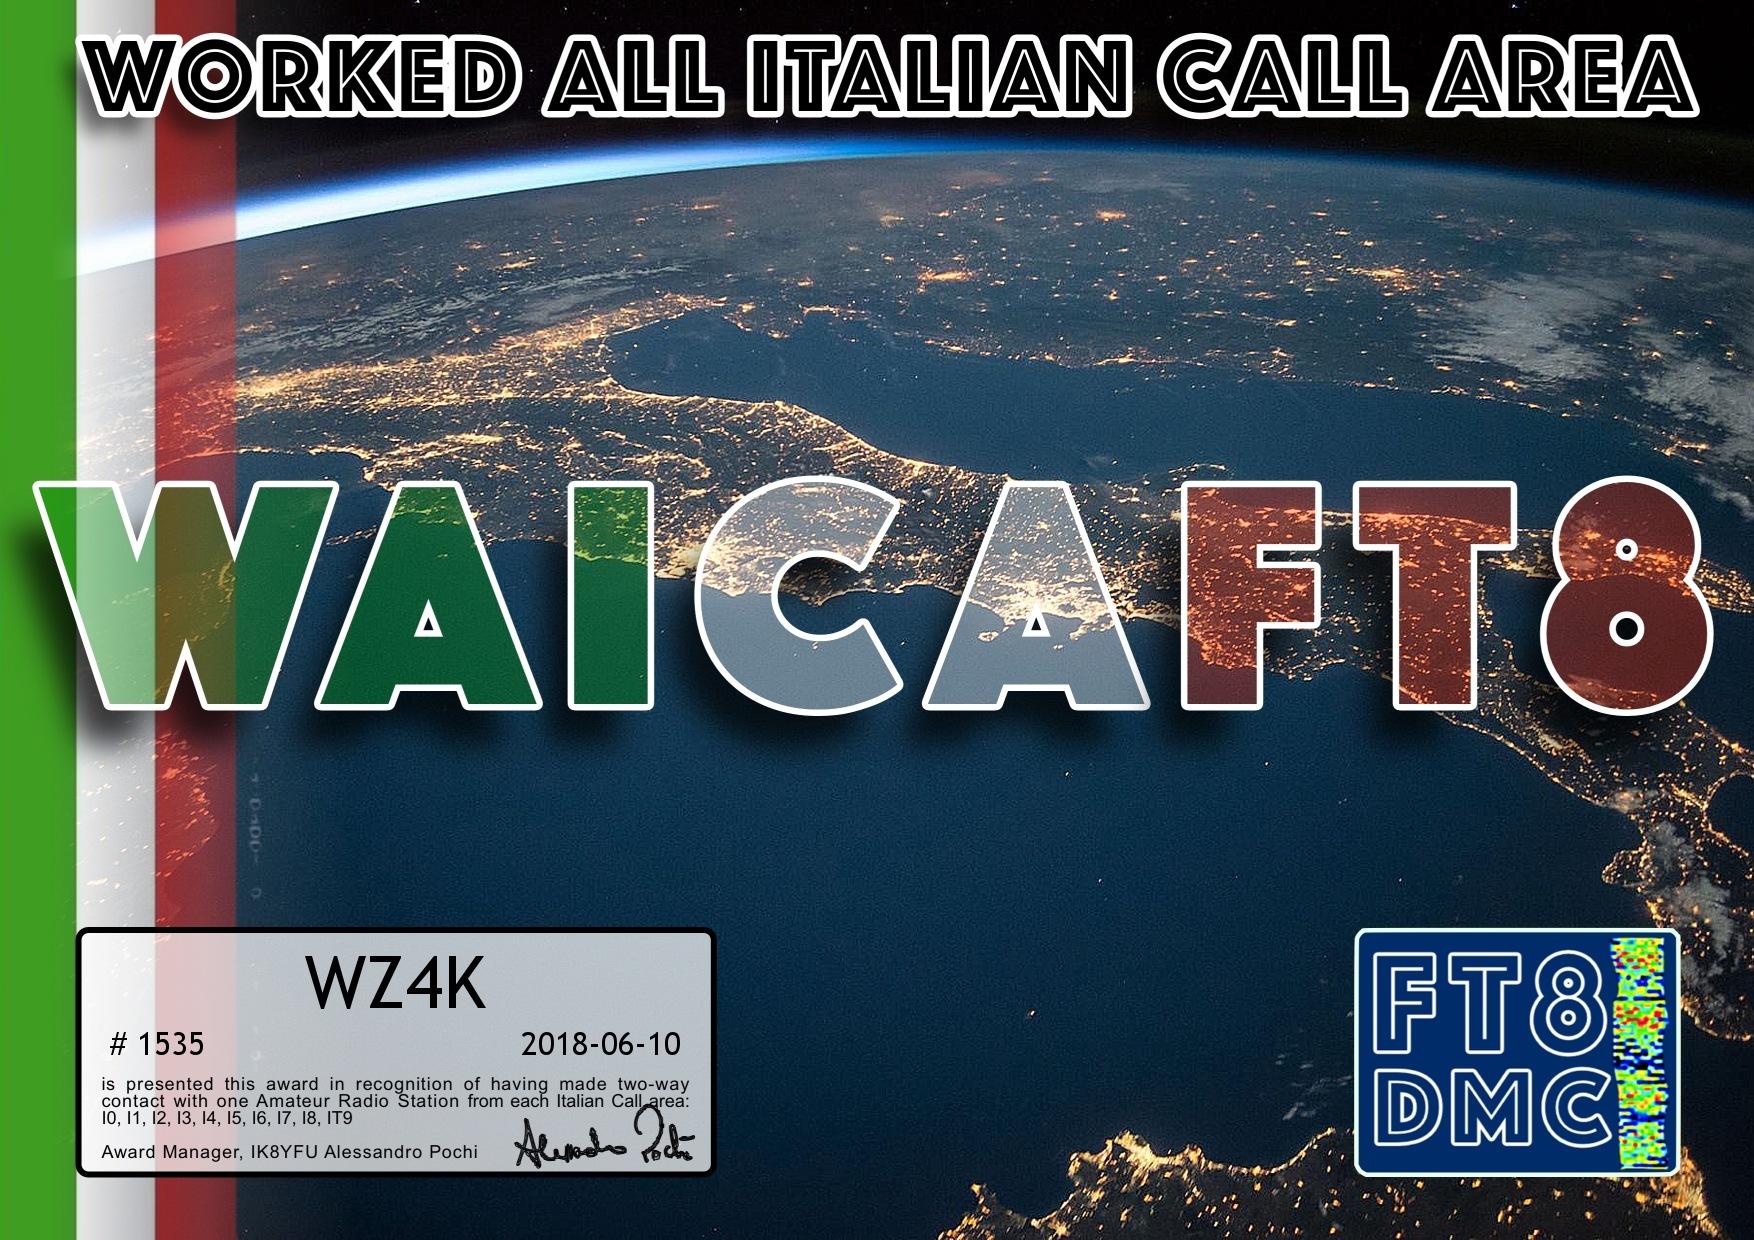 WZ4K-WAICA-WAICA